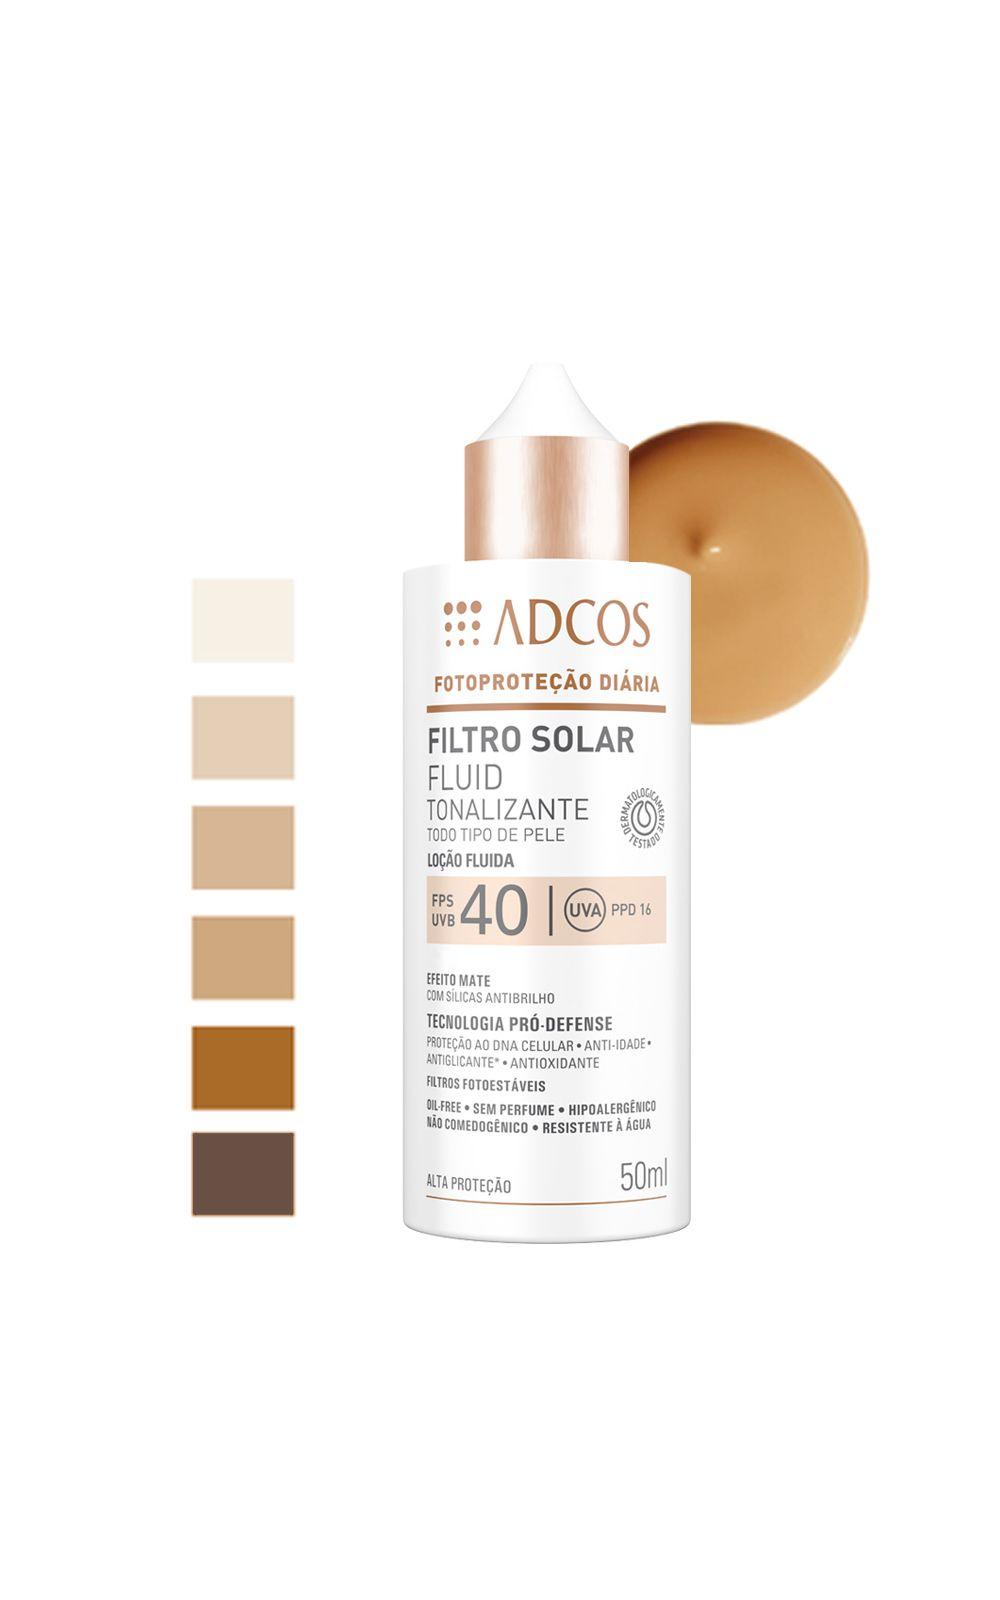 Foto 4 - Adcos Filtro Solar Fluid Tonalizante Fps40 - Bronze